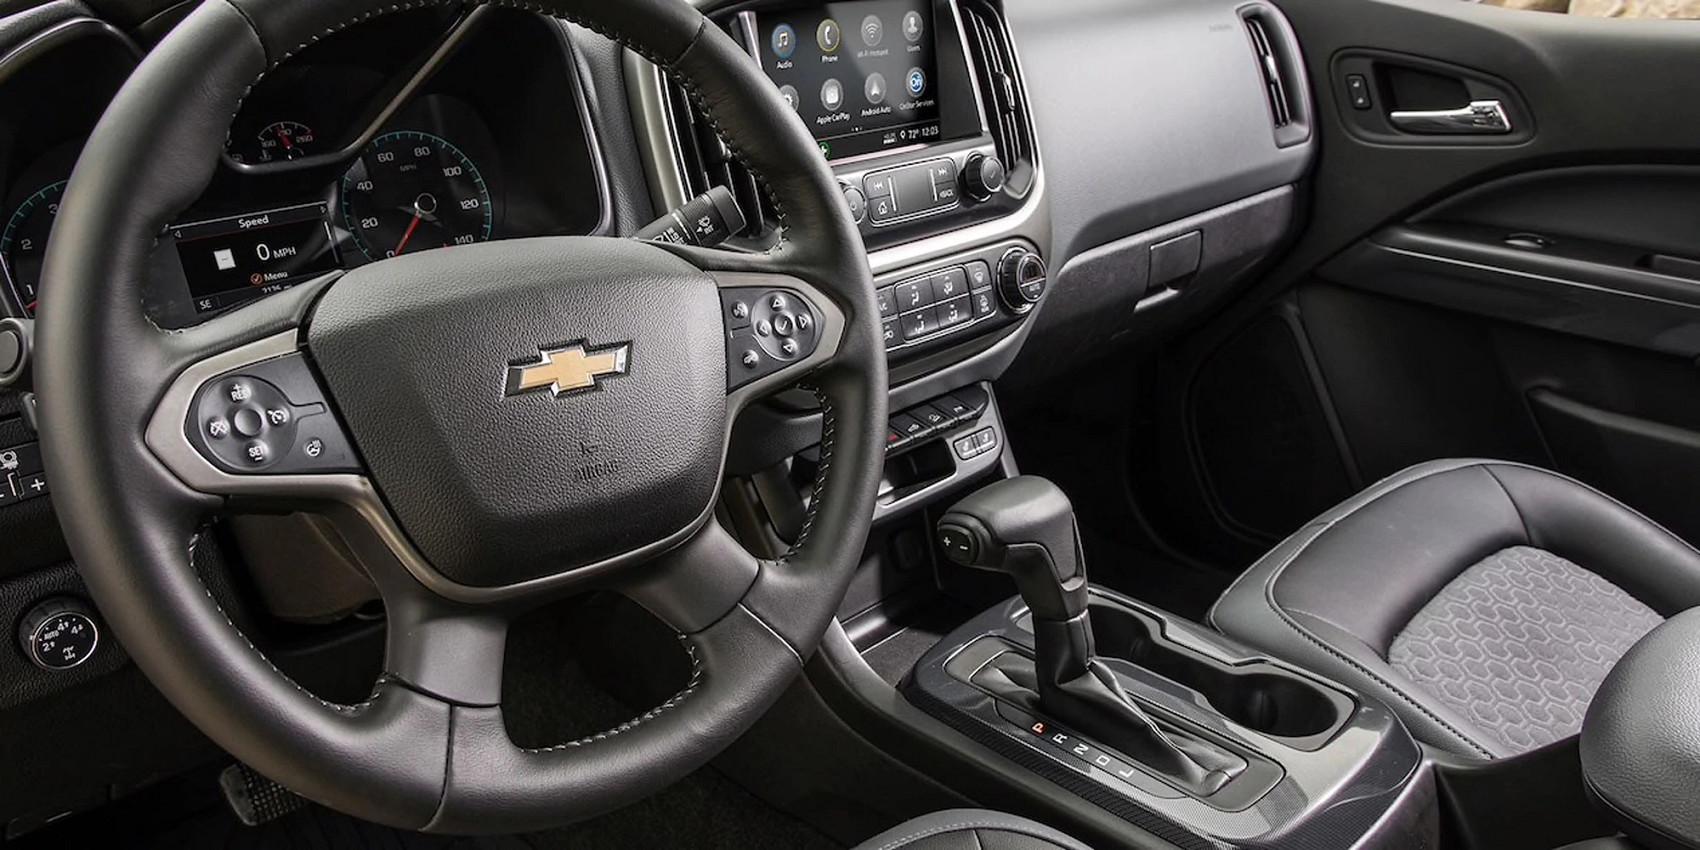 Optional Heated Steering Wheel in the 2020 Colorado